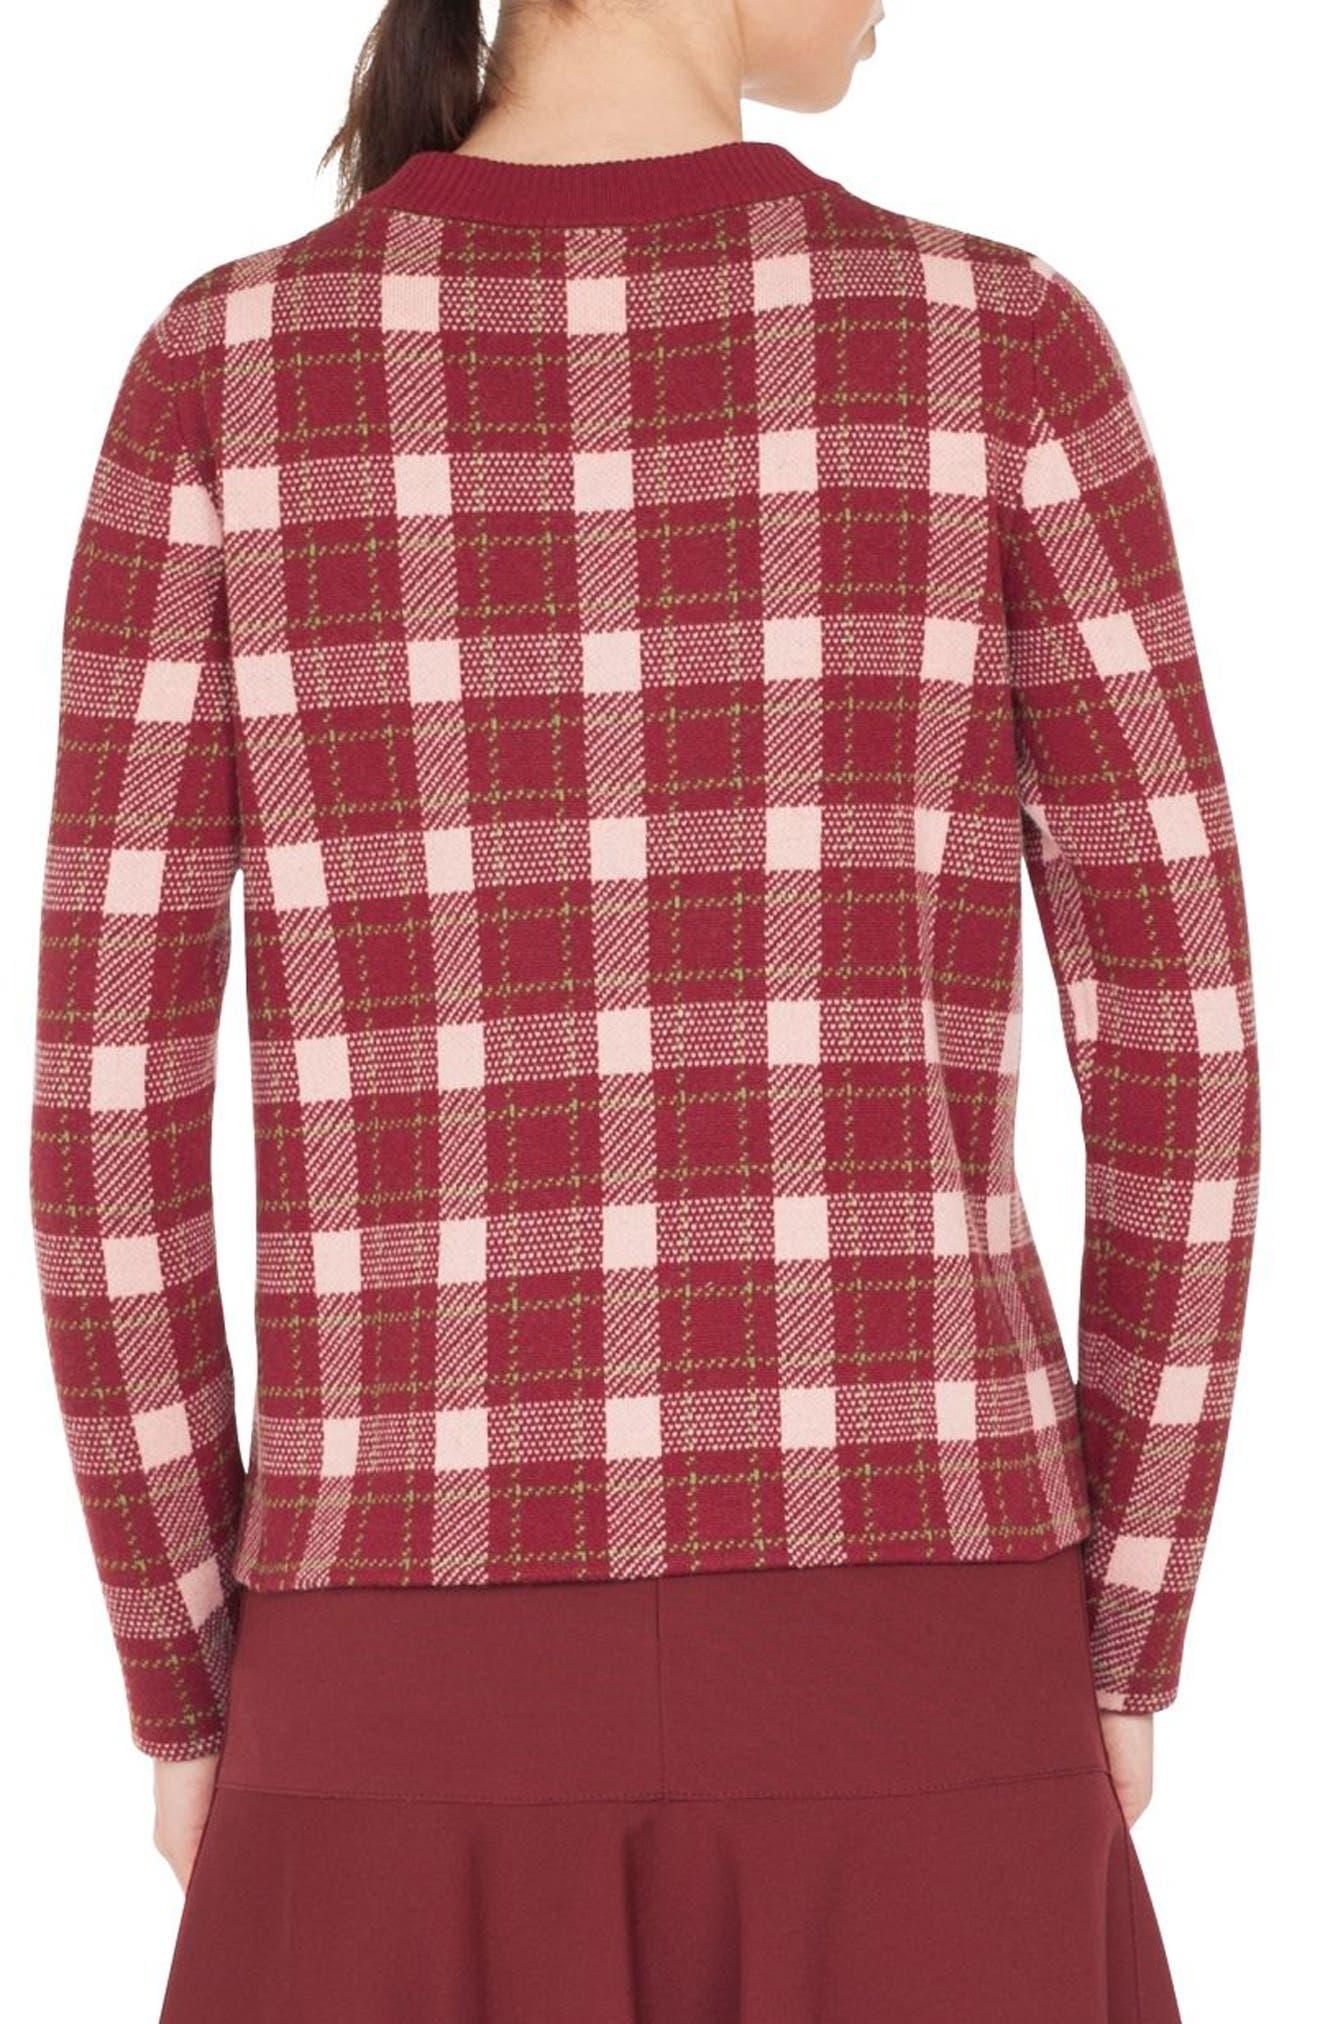 Brit Check Wool & Cashmere Pullover,                             Alternate thumbnail 2, color,                             BLUSH ROSE/ BURGUNDY